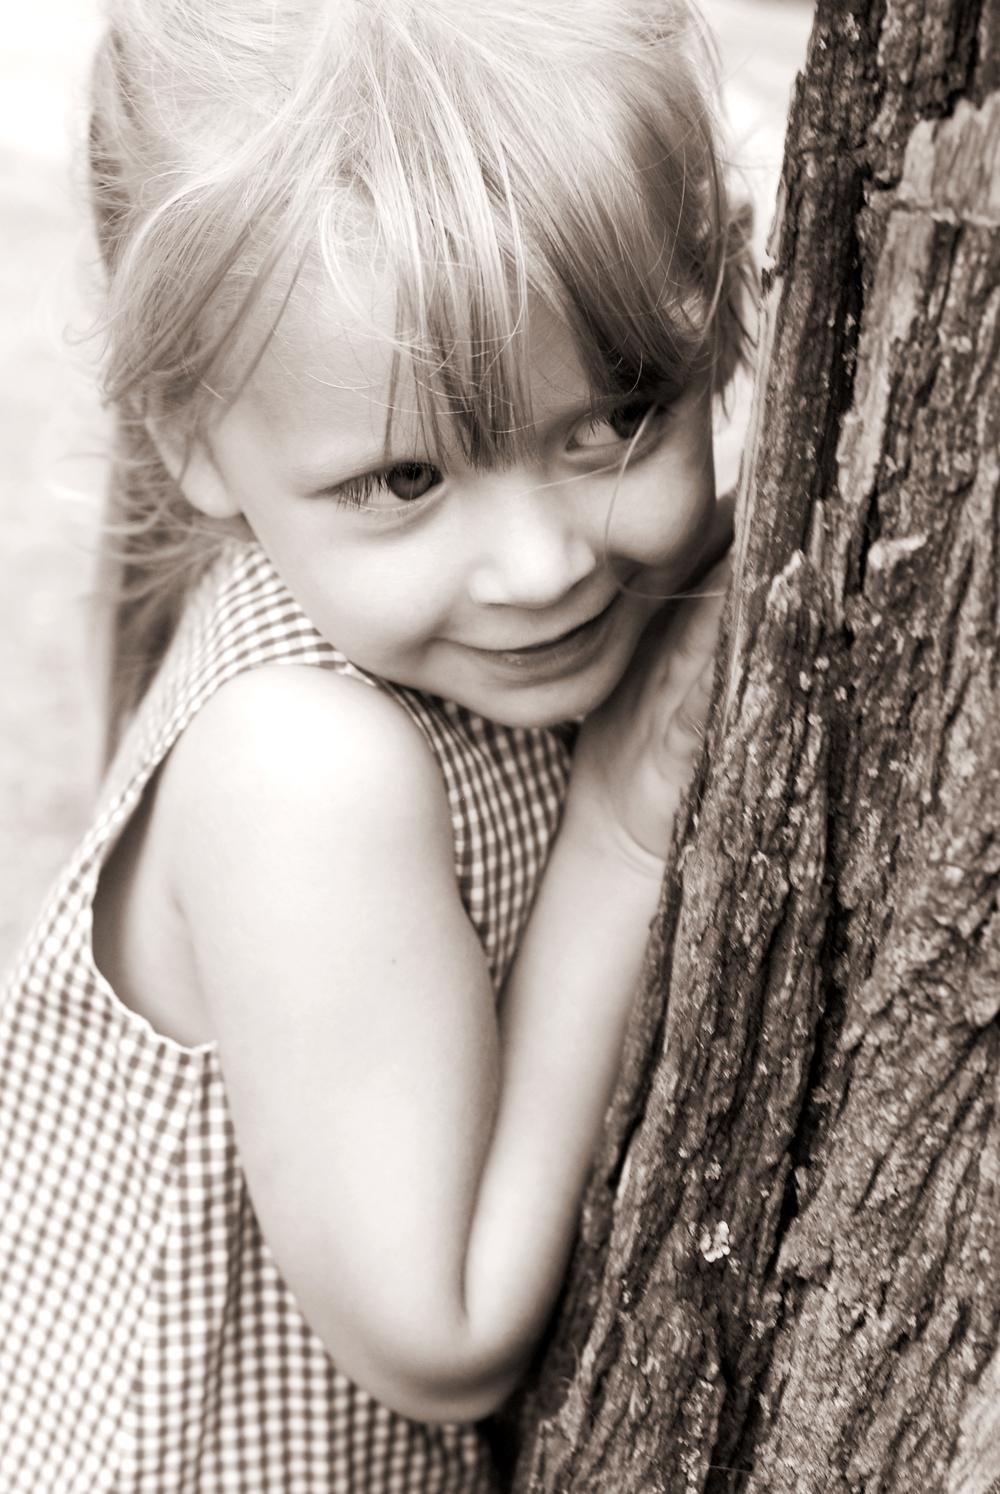 _DSC0242 emma coy behind tree.jpg